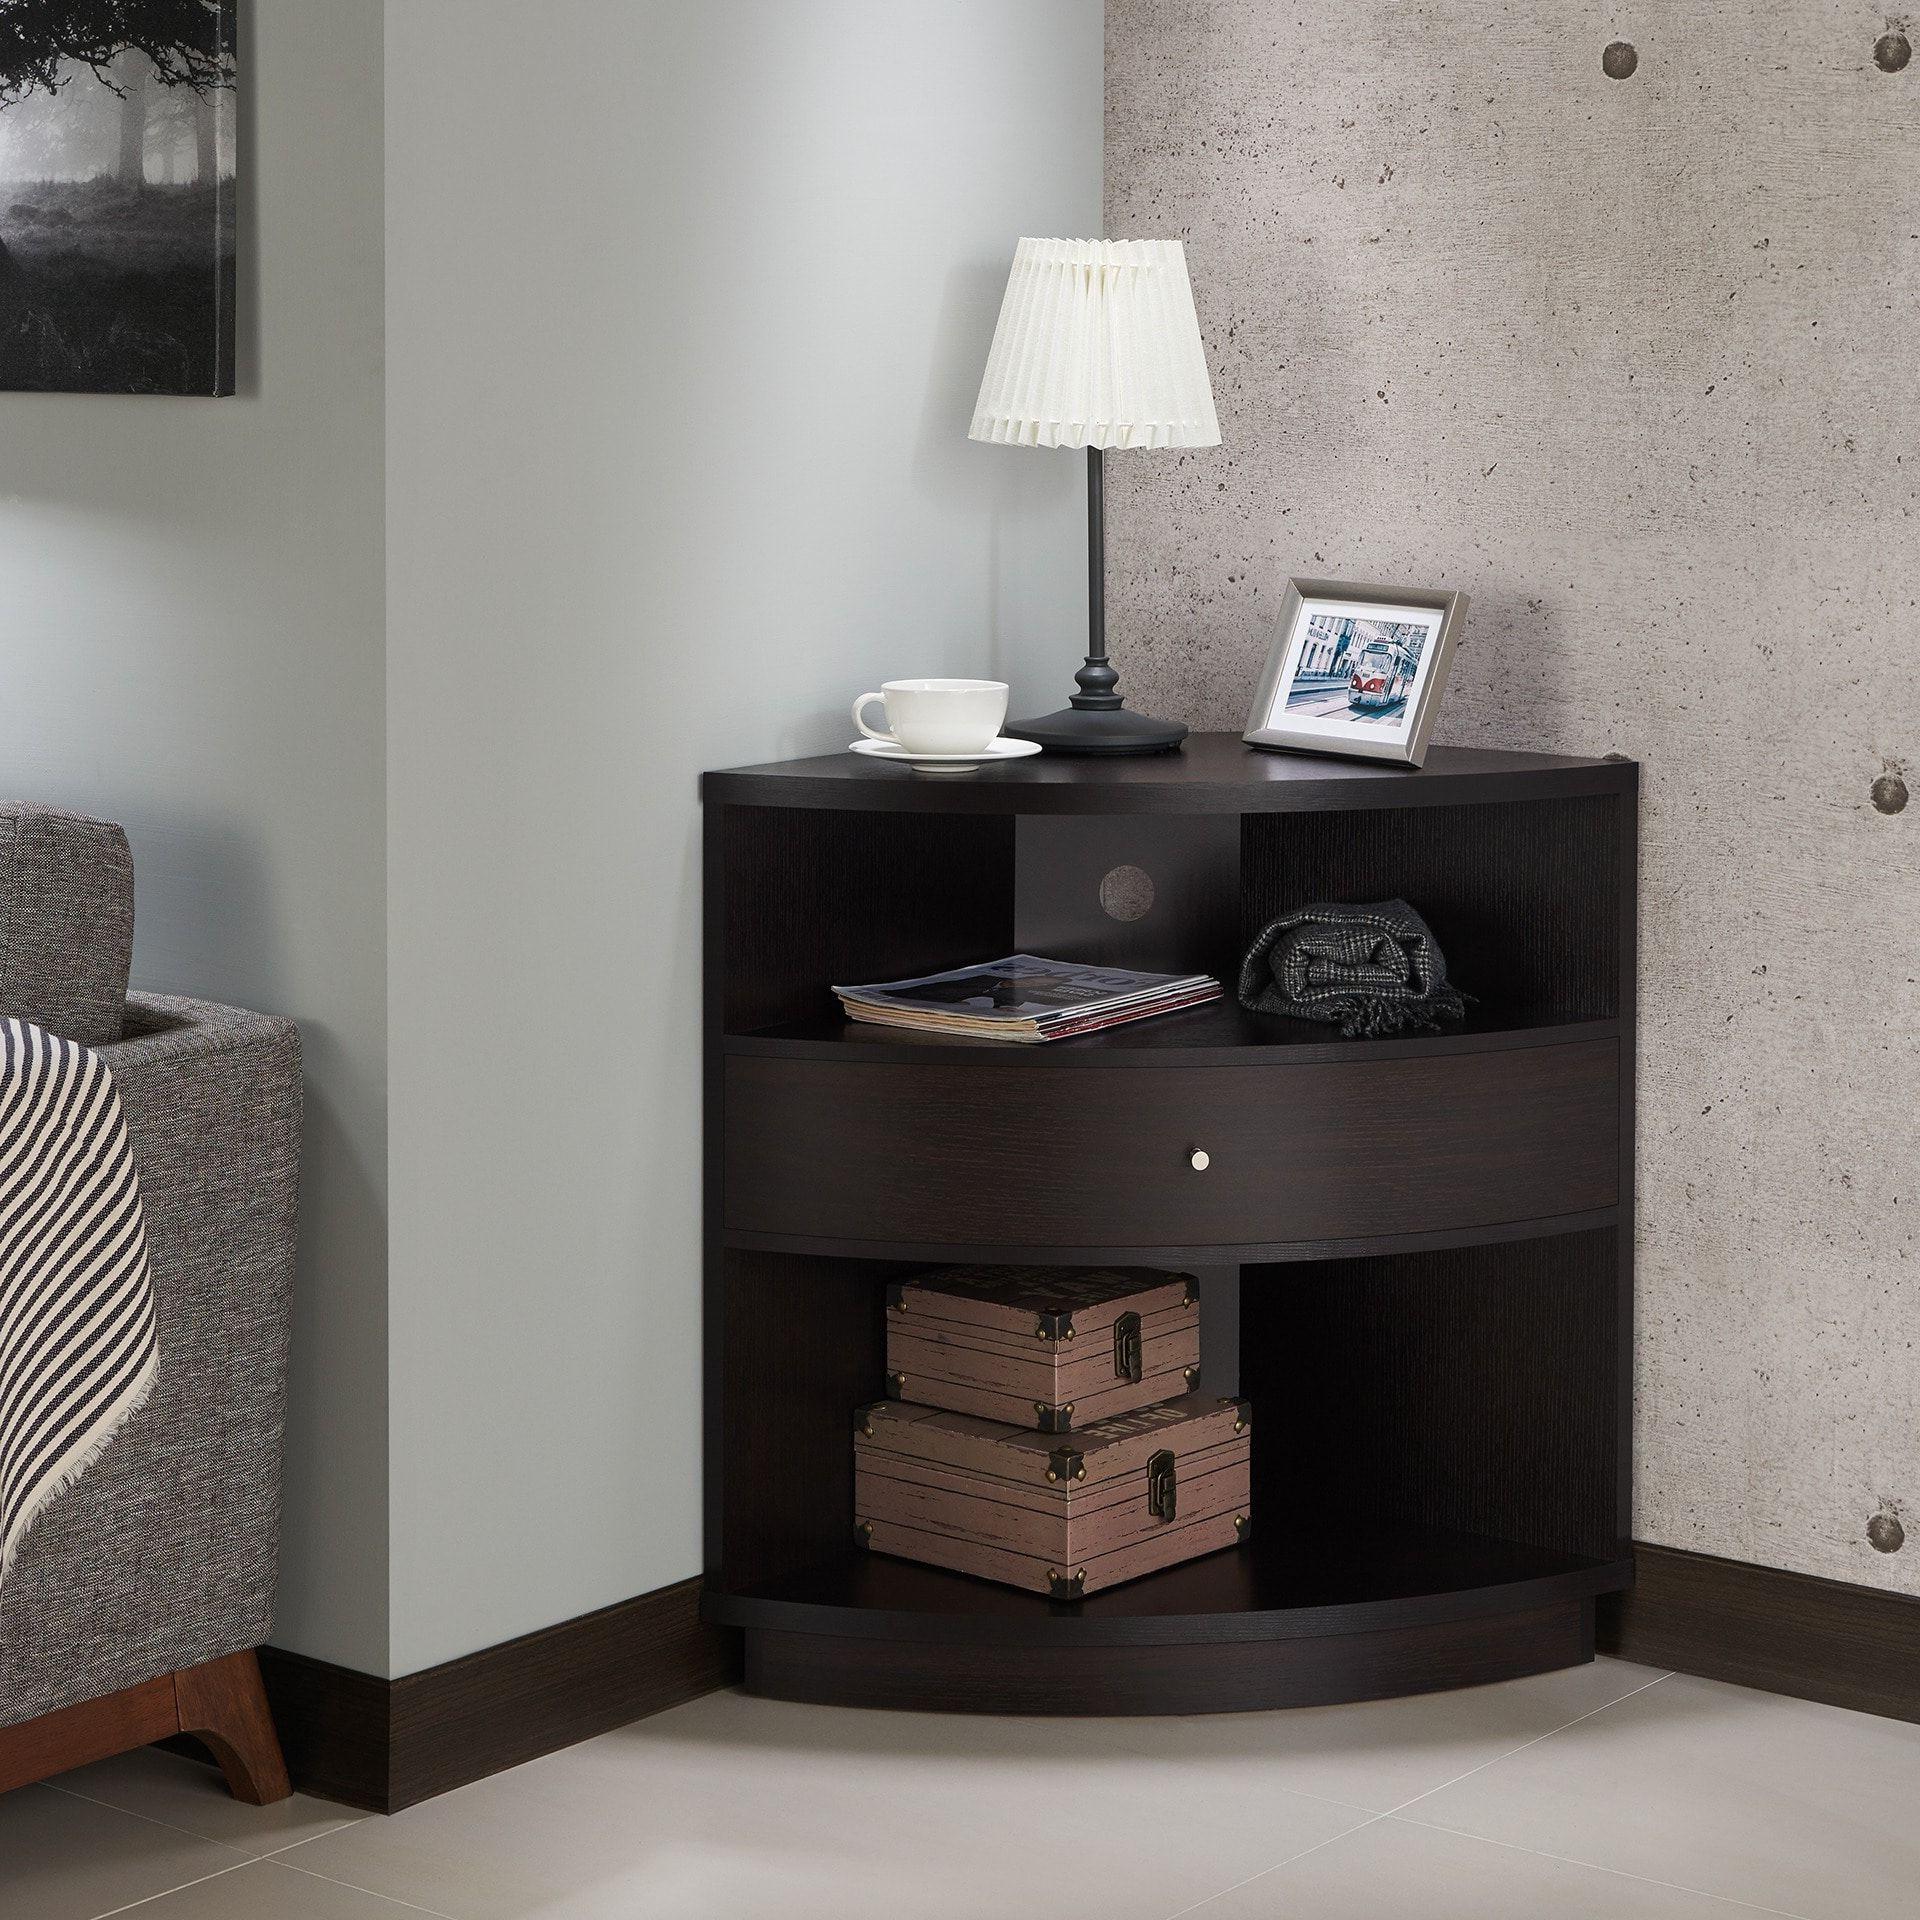 Furniture Of America Aishe Contemporary Multi Shelf Corner Regarding Multi Shelf Corner Buffets (View 4 of 20)